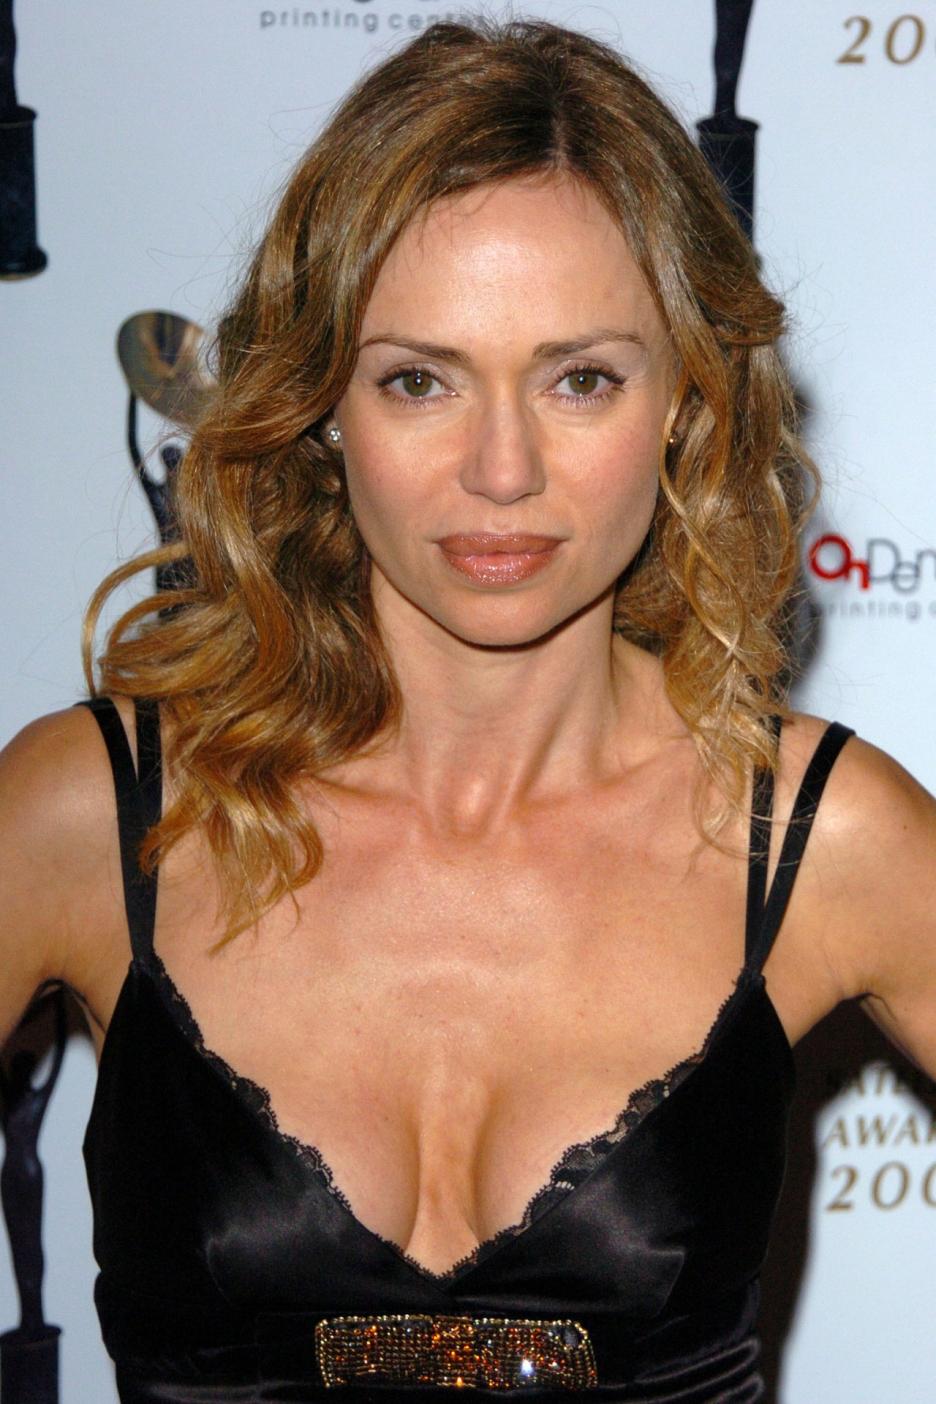 Vanessa Angel, ingiliz sinema ve dizi oyuncusu